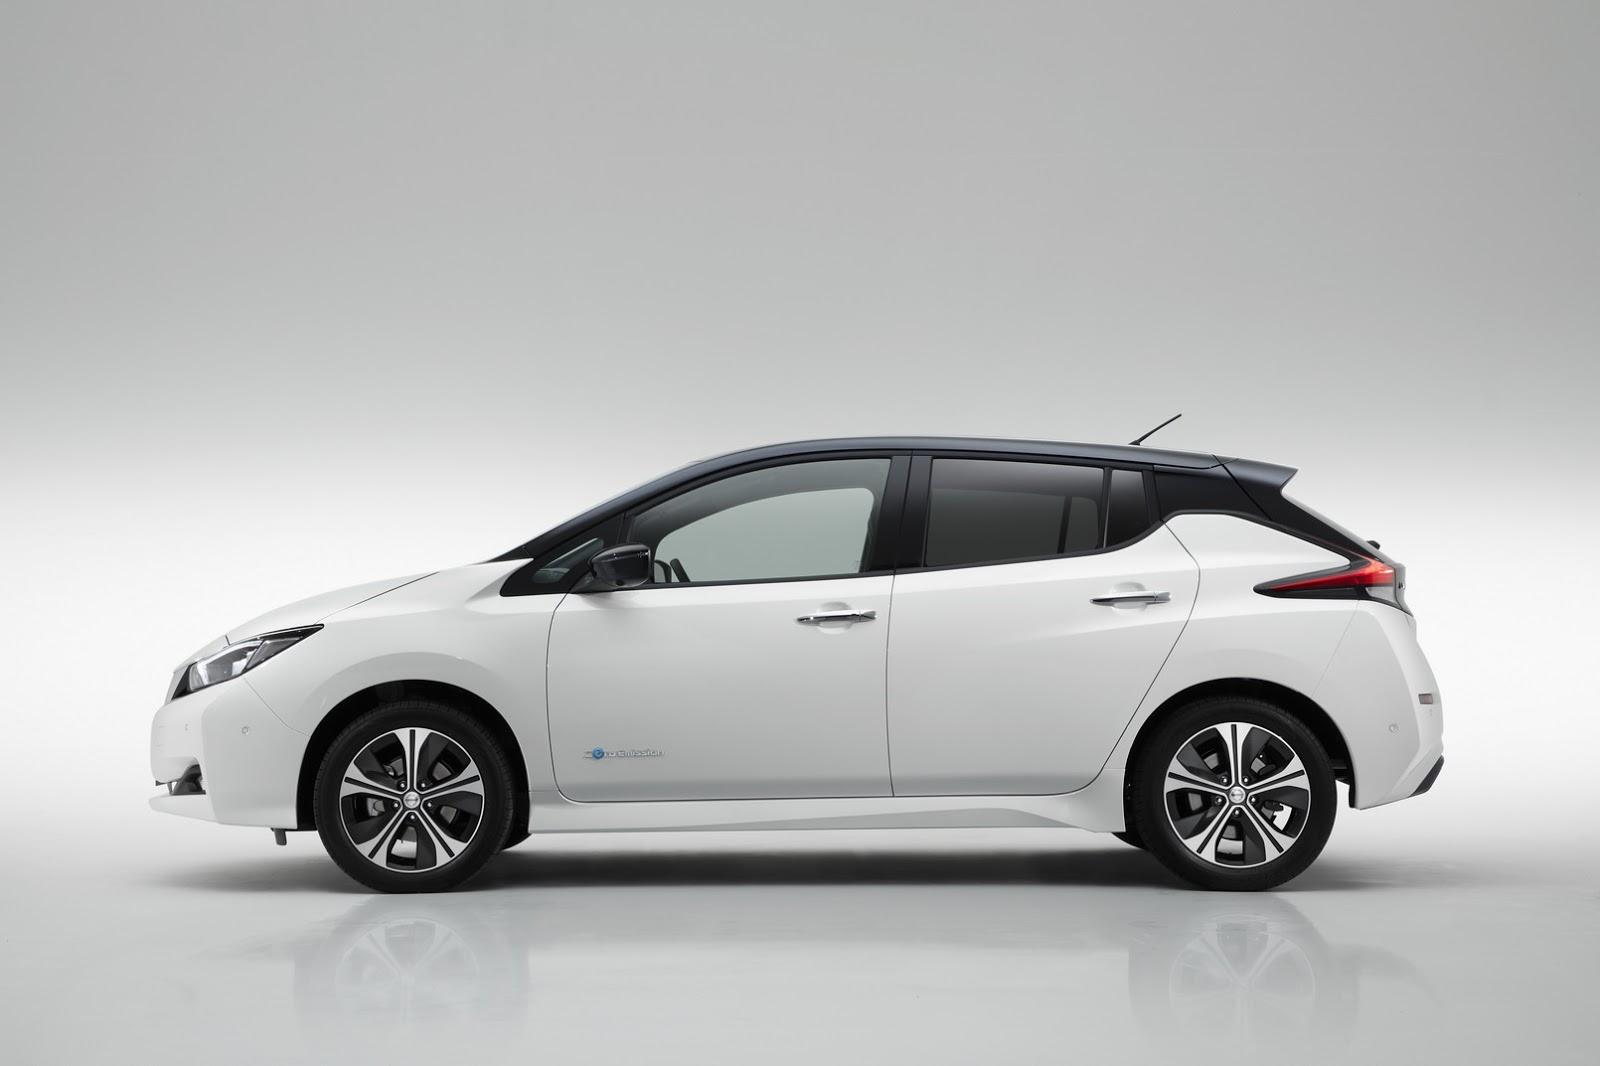 Nissan Leaf 2018 EU (3)